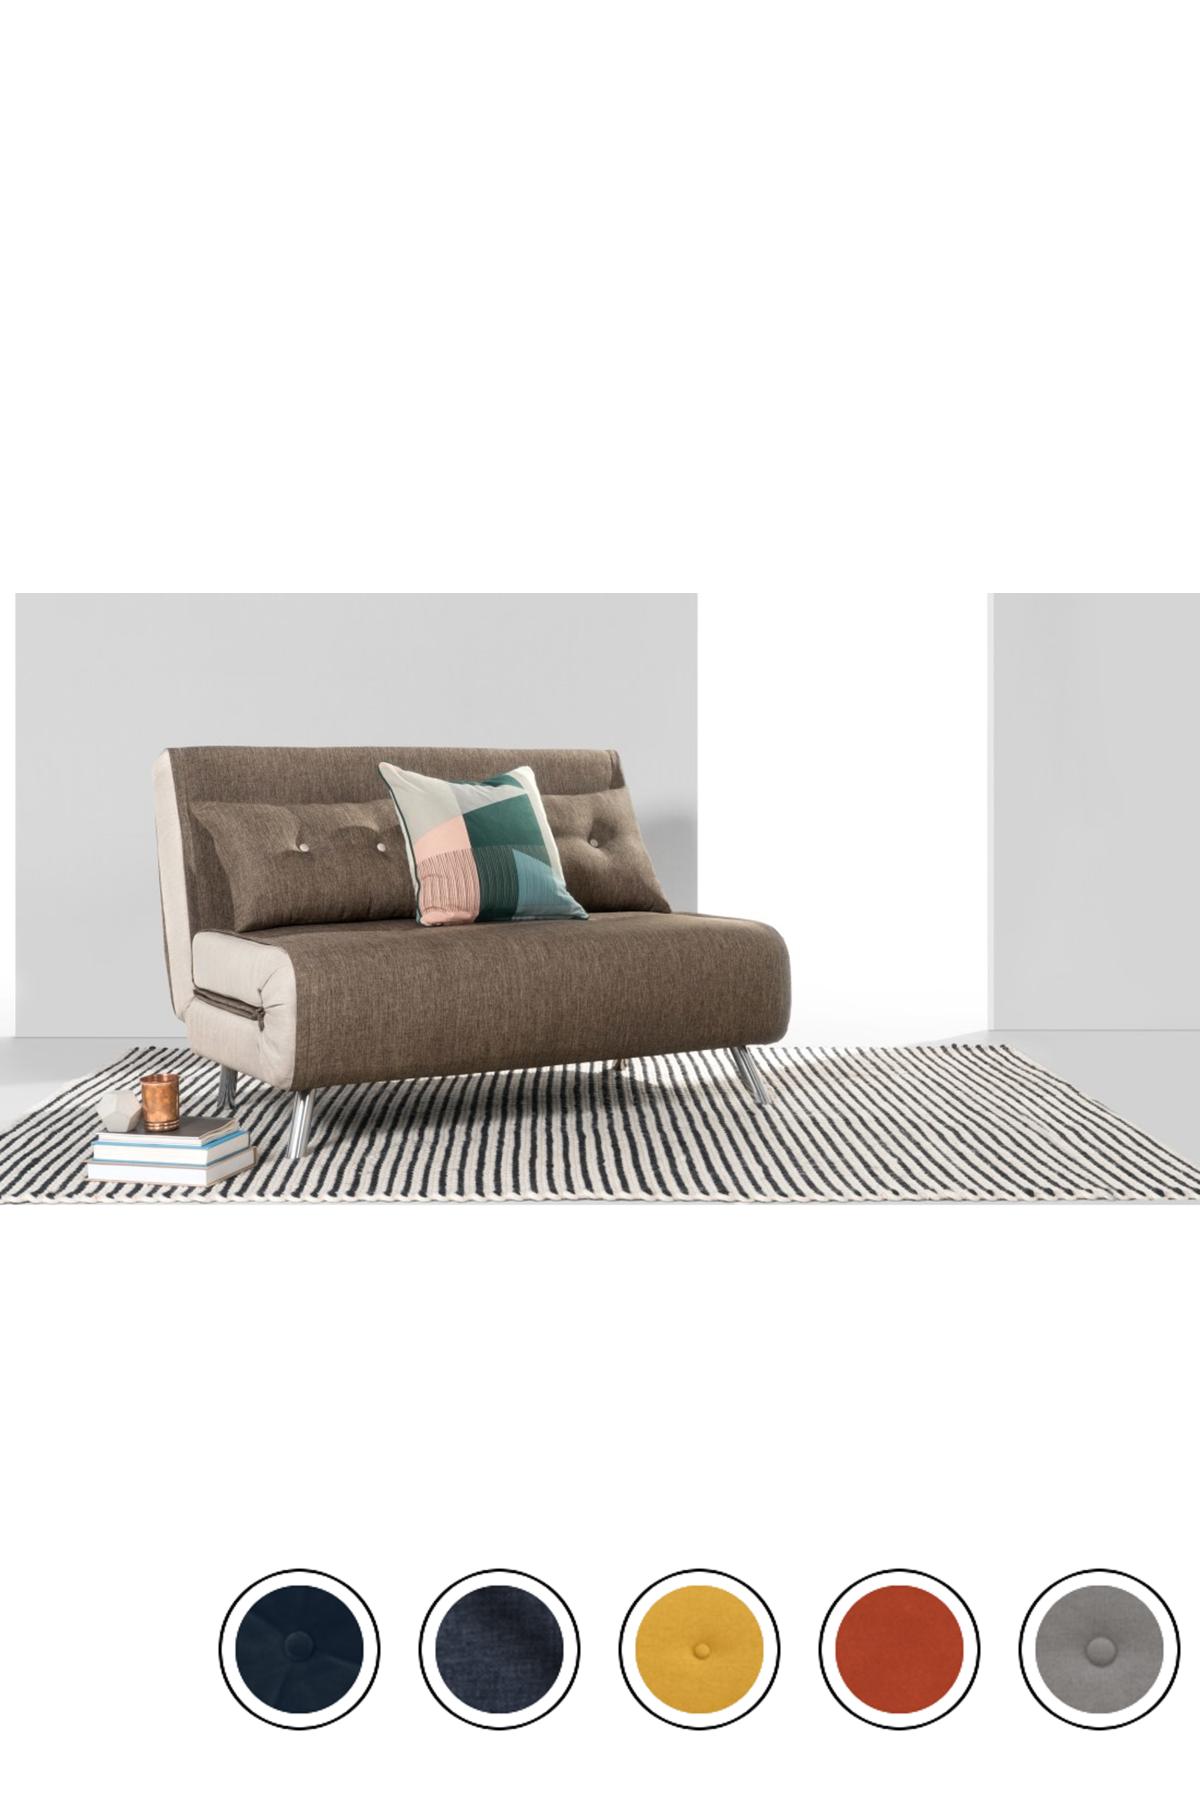 Made Small Sofa Bed Woodland Brown